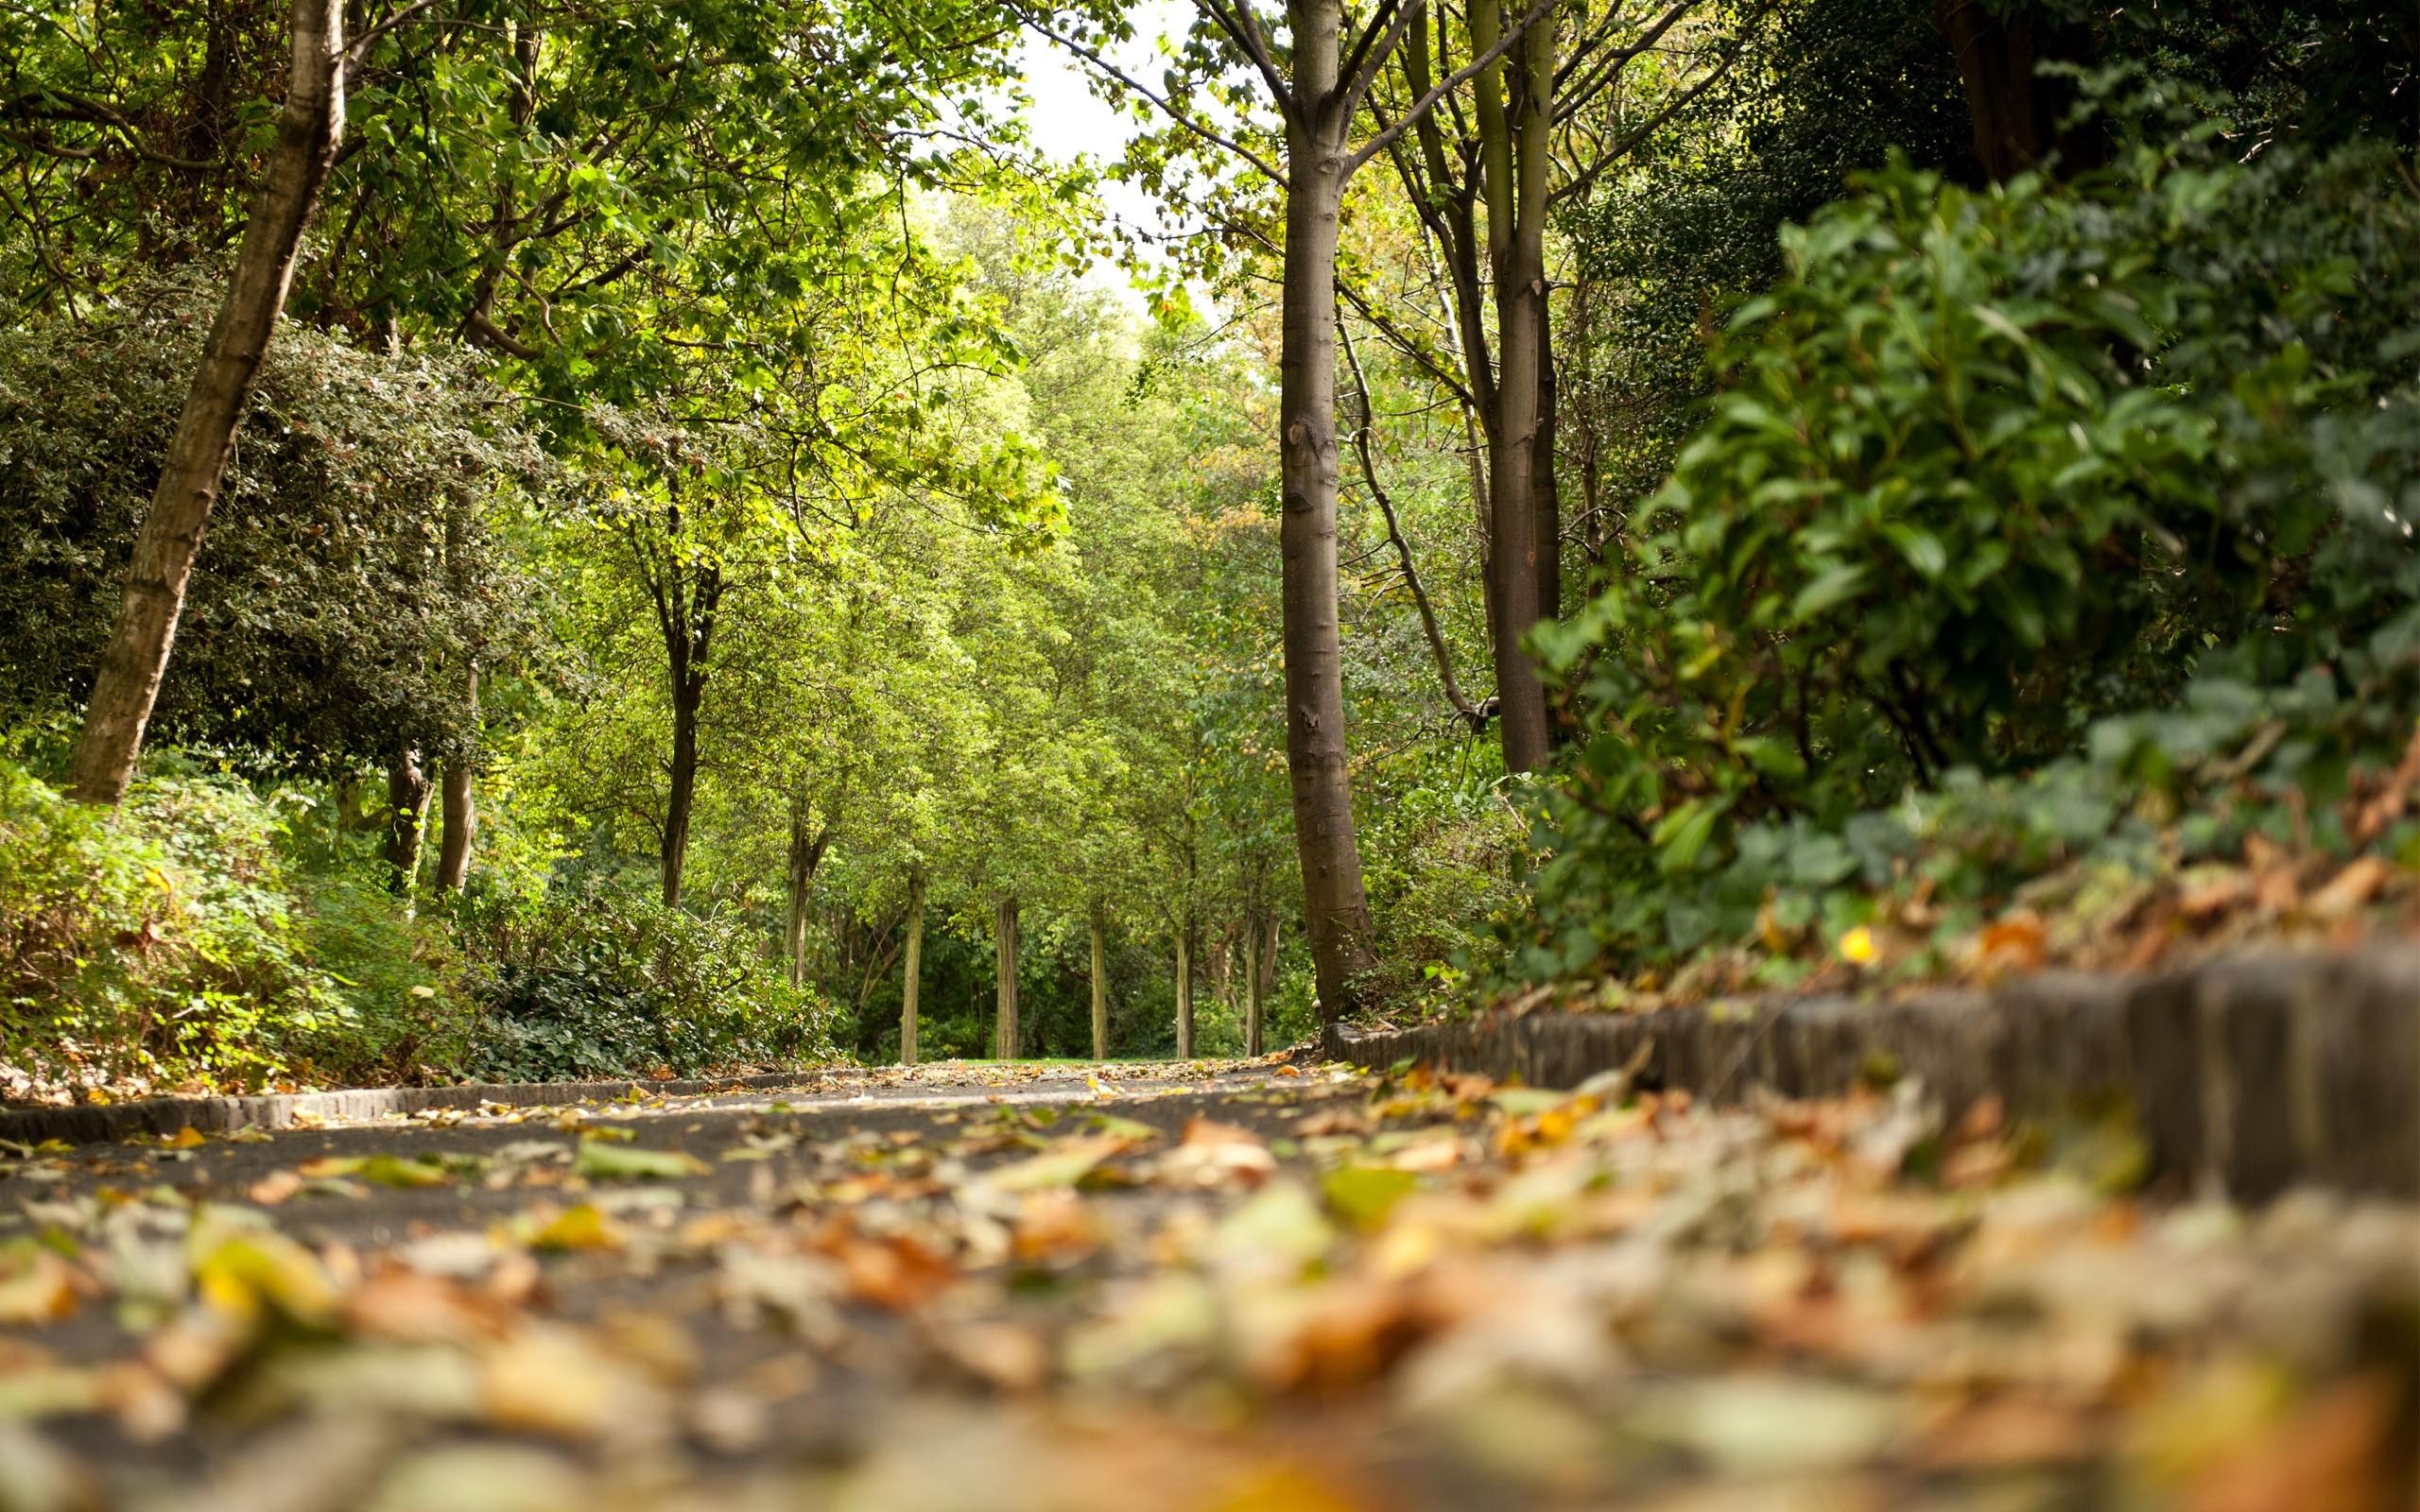 seasons-autumn-scene-in-germany-backgrounds-wallpapers.jpg